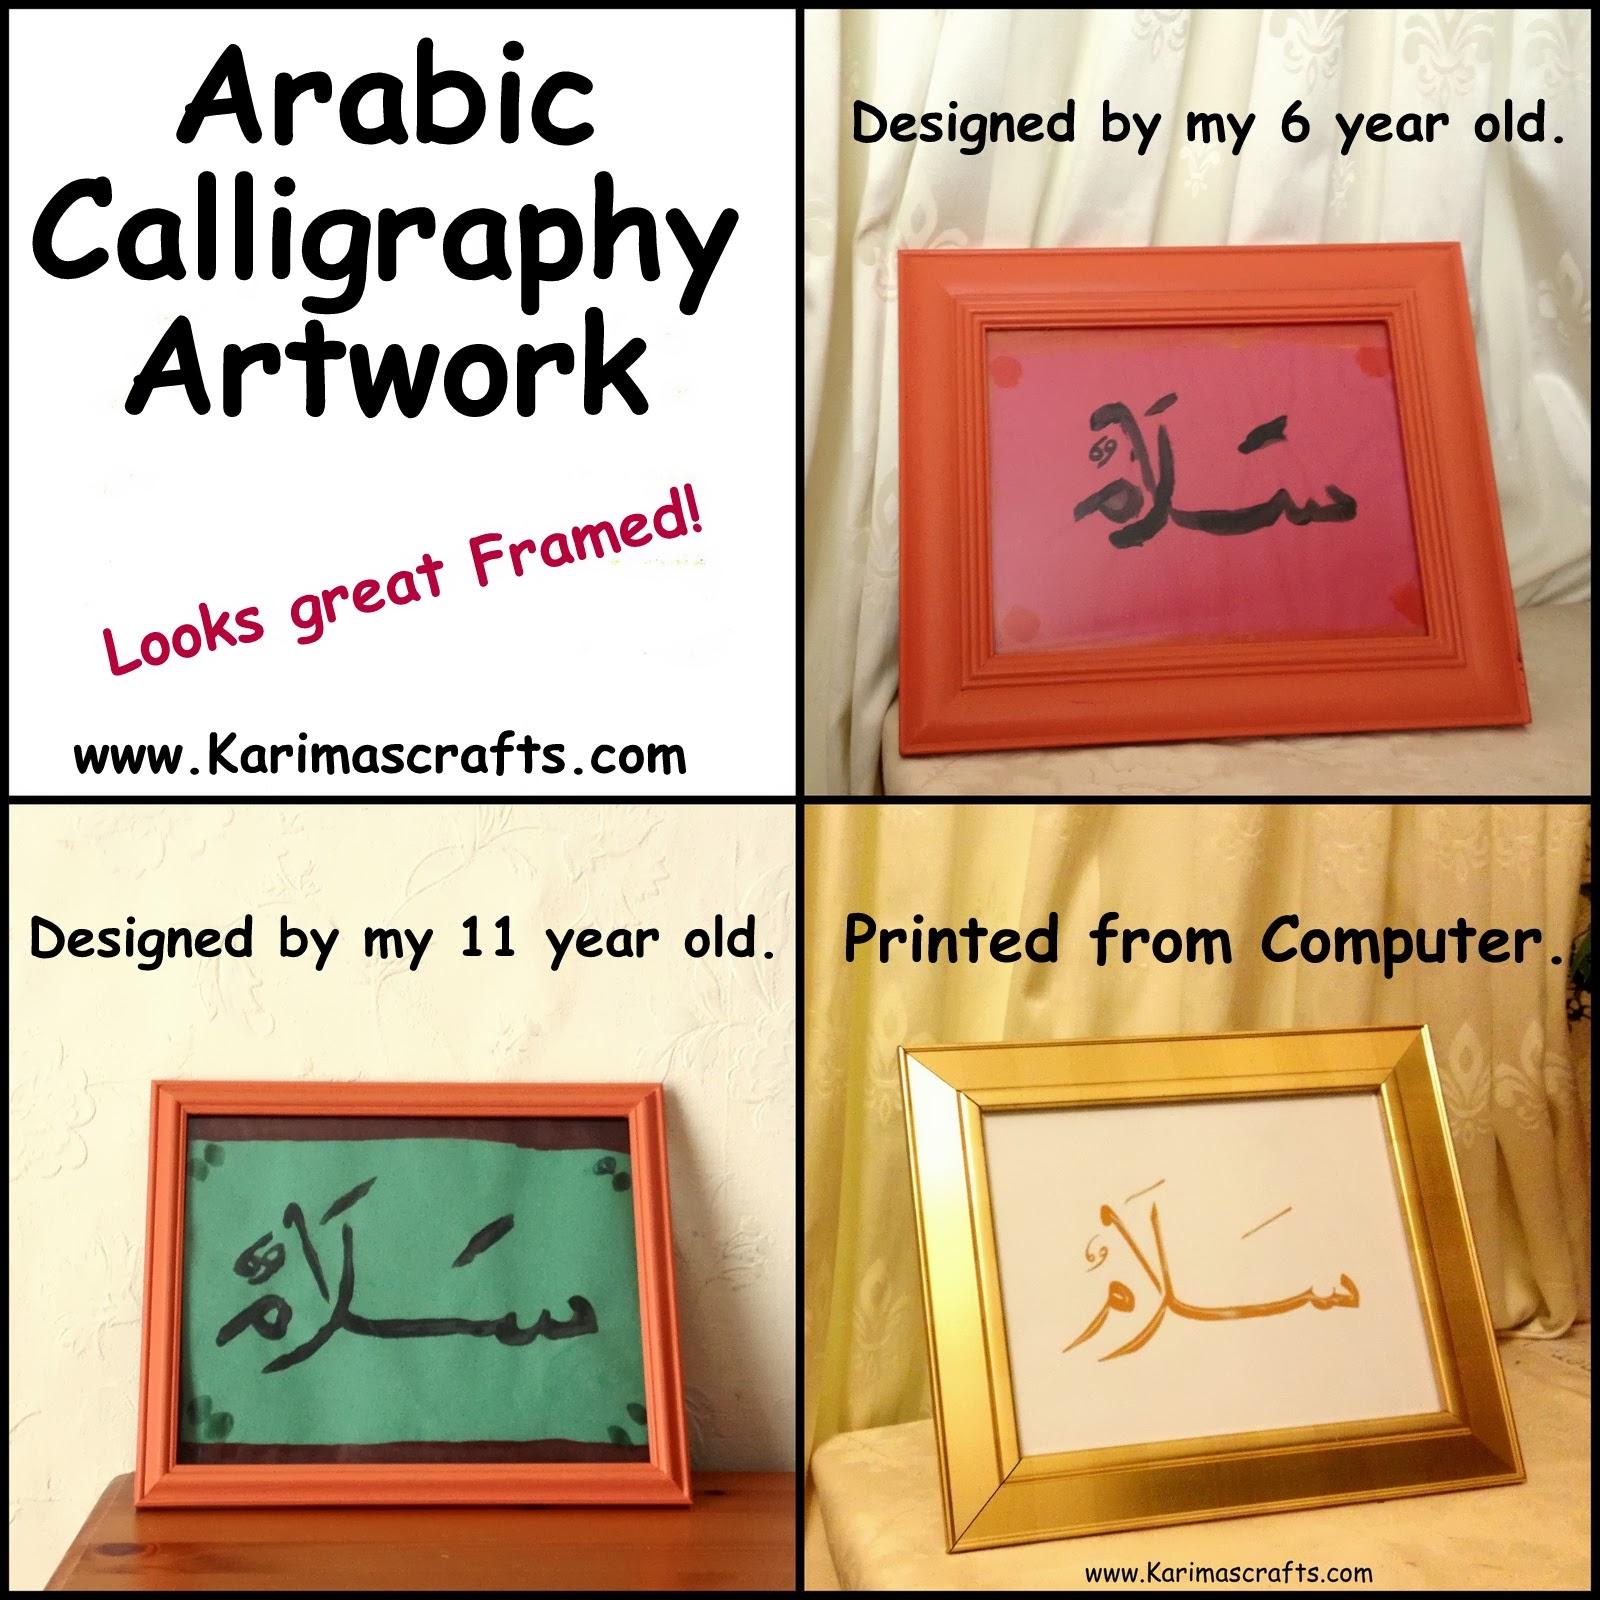 Karima's Crafts: Arabic Calligraphy Artwork - 30 Days of Ramadan Crafts